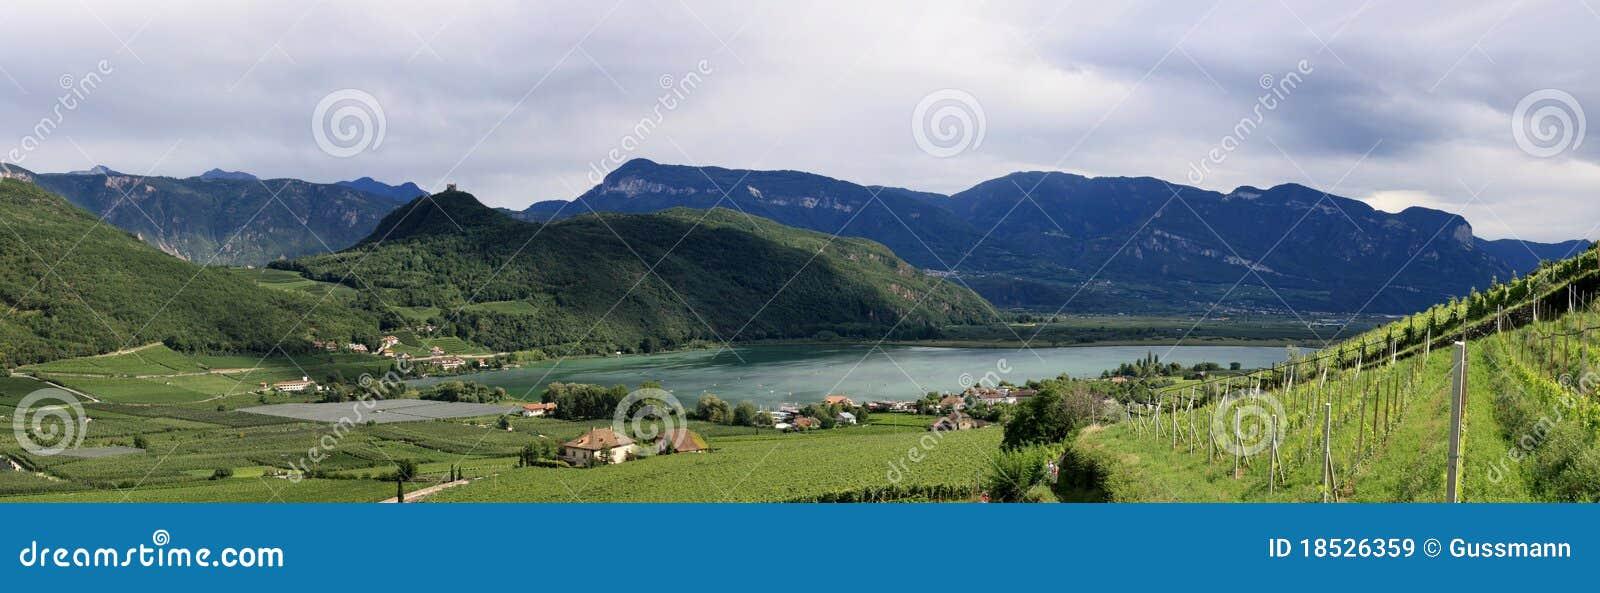 Sehen Sie in Tirol